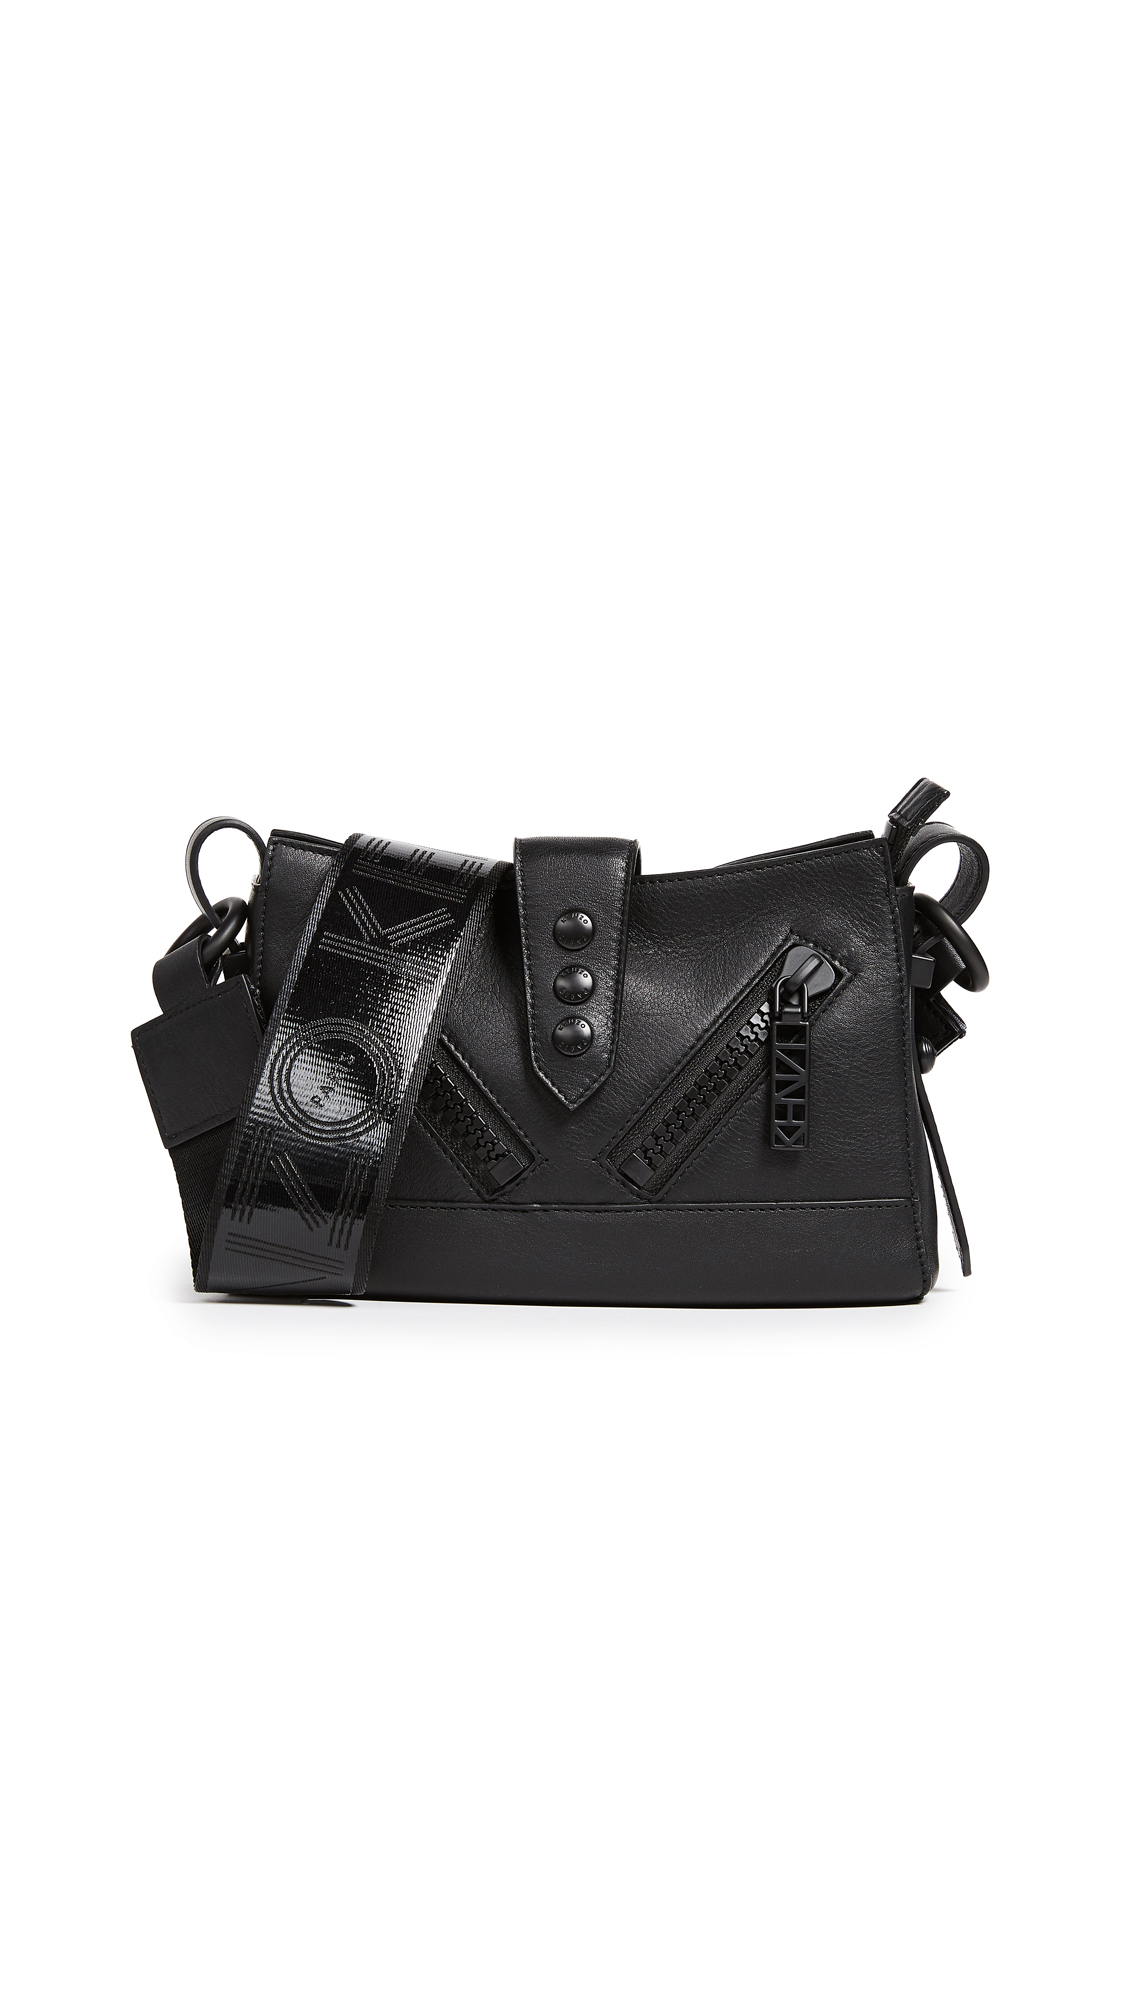 KENZO Kalifornia Mini Shoulder Bag - Black